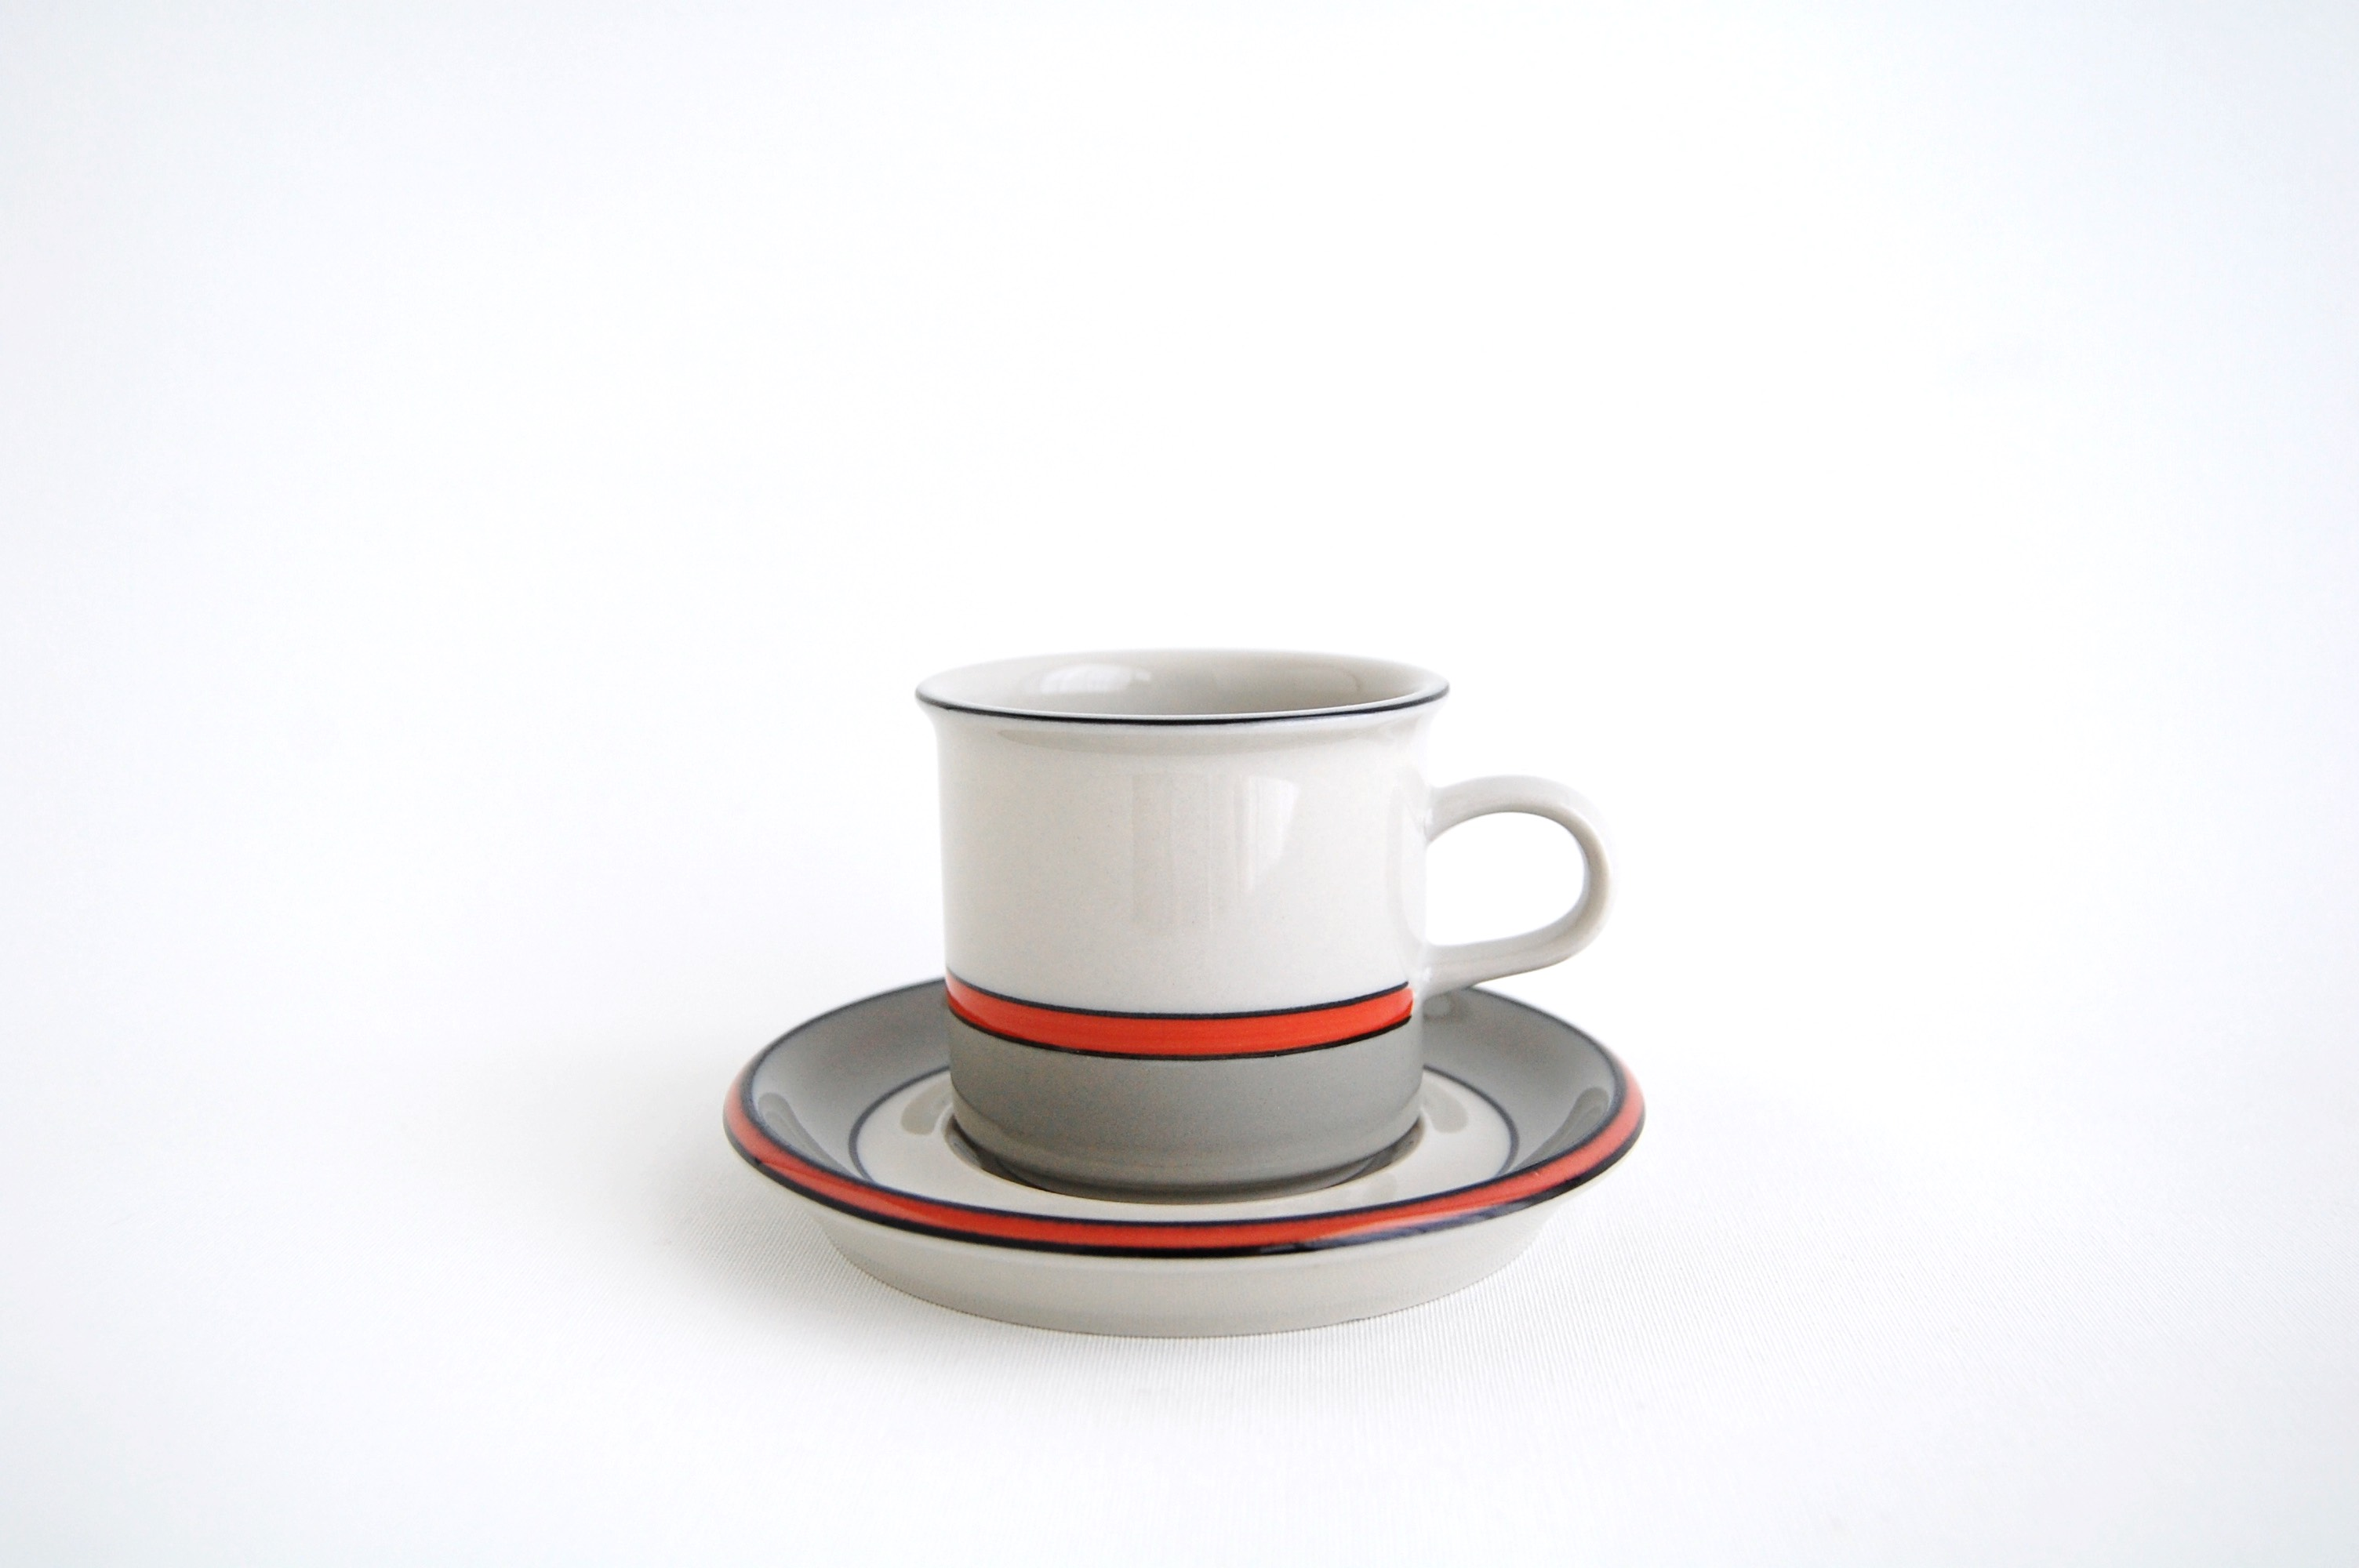 ARABIA/アラビア Aslak/アスラク コーヒーカップ&ソーサー(ショートサイズ) 002